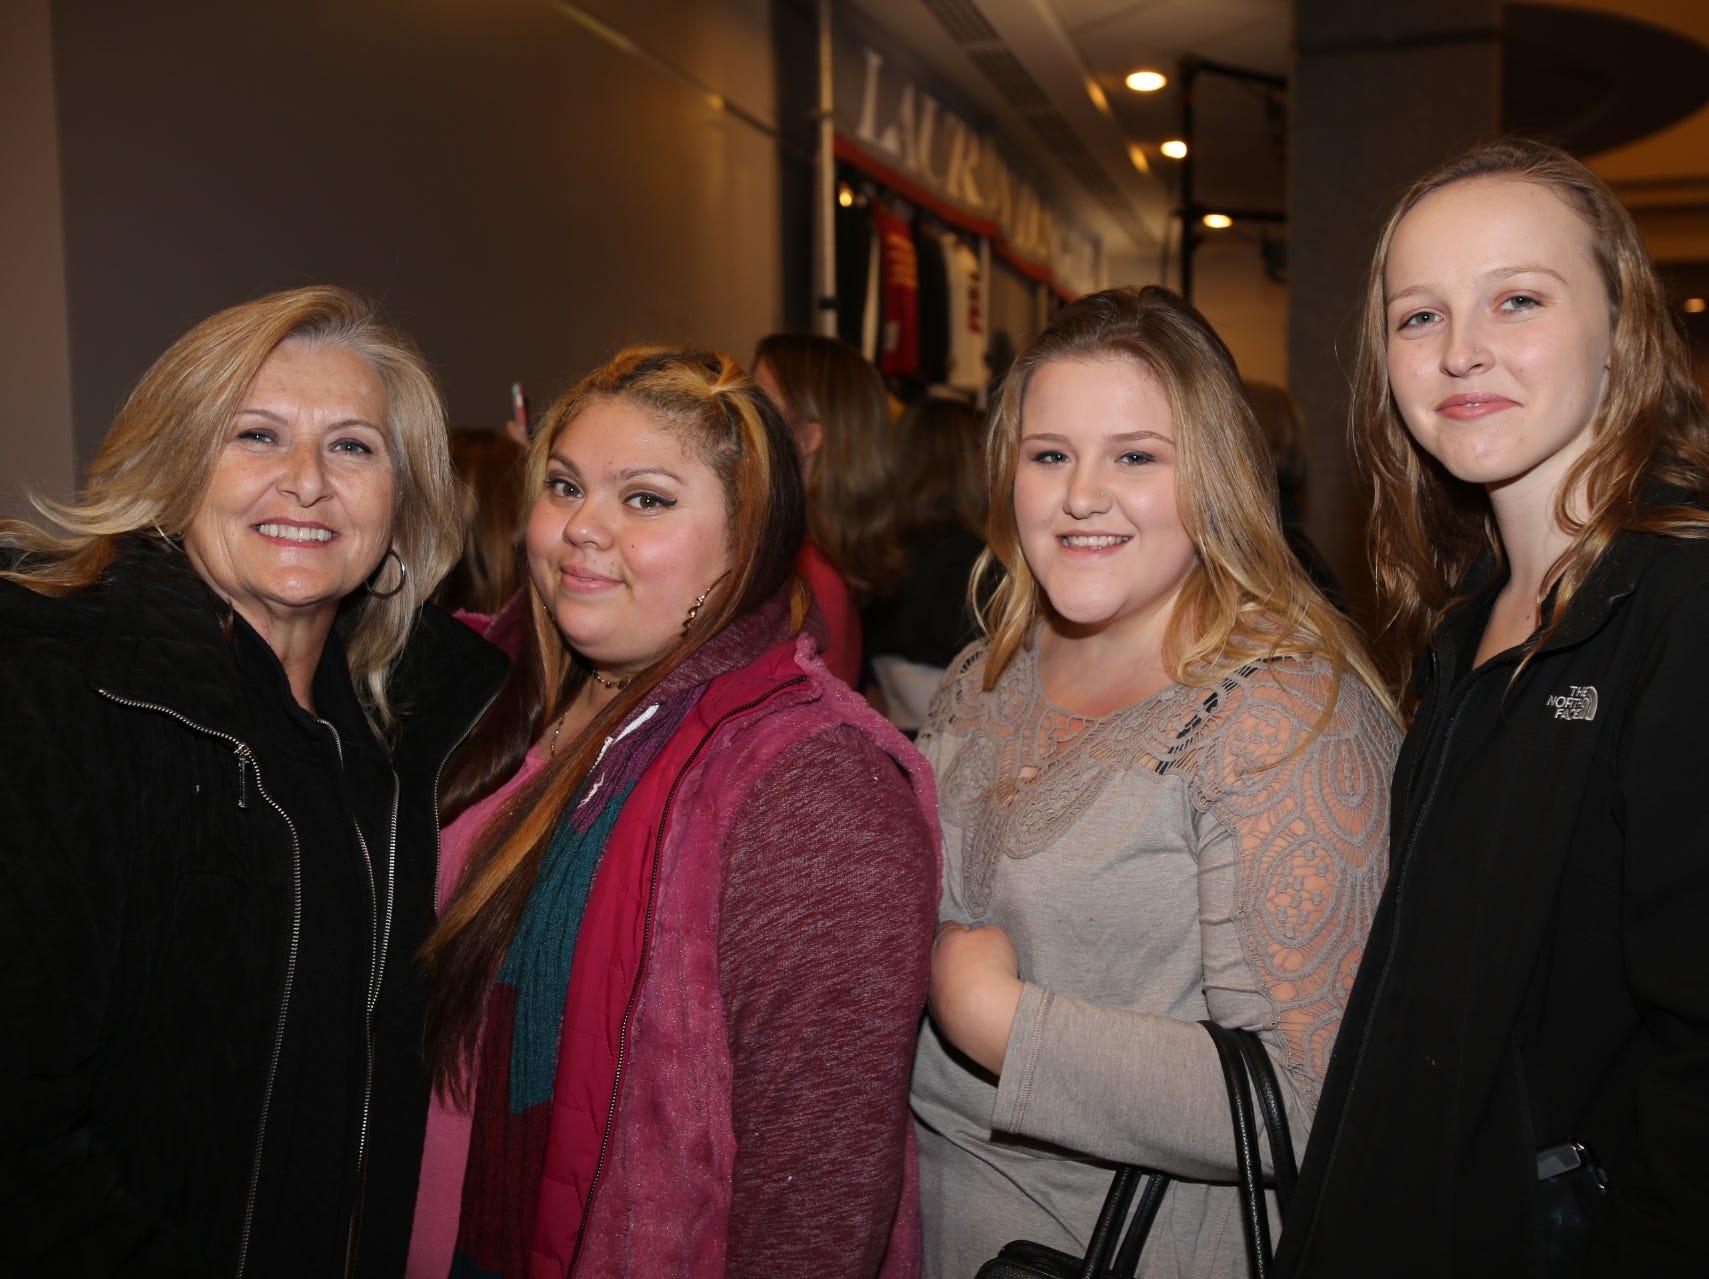 Sue Gunter, Crystal Carrillo, Elizabeth and Mikayla Bentz